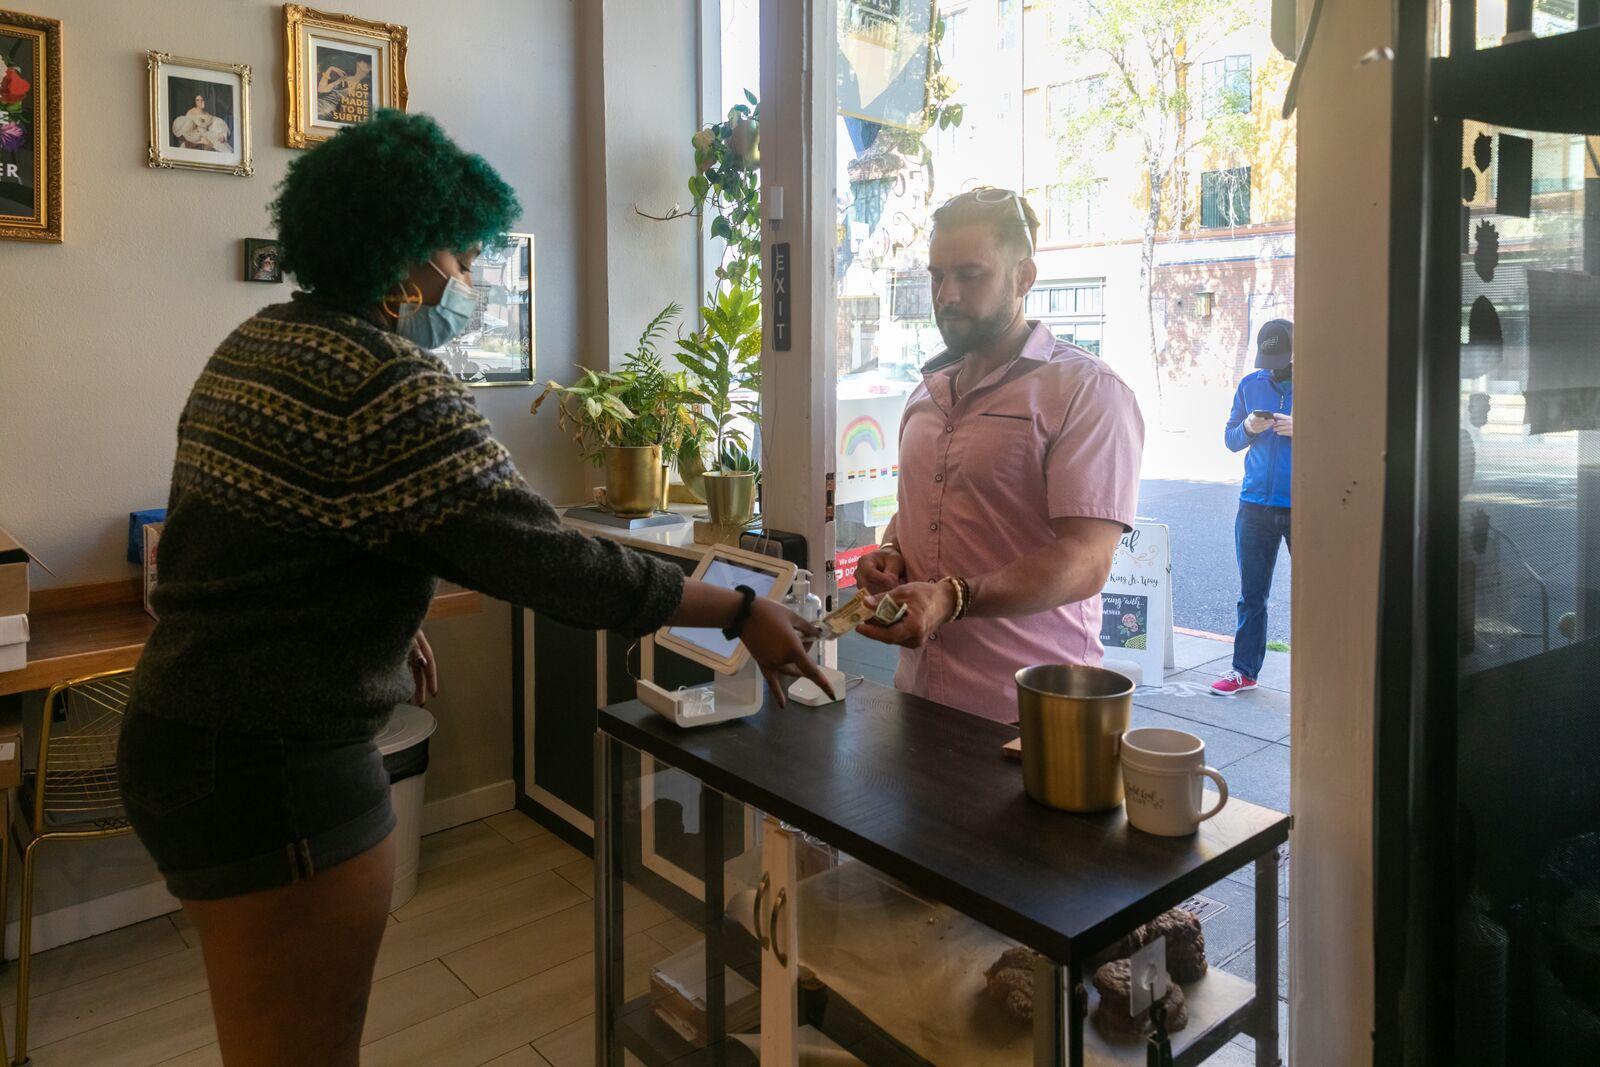 Quiandra Watson takes the order of Derrick Walker at Gold Leaf Cafe on June 15, 2021. Credit: Kelly Sullivan